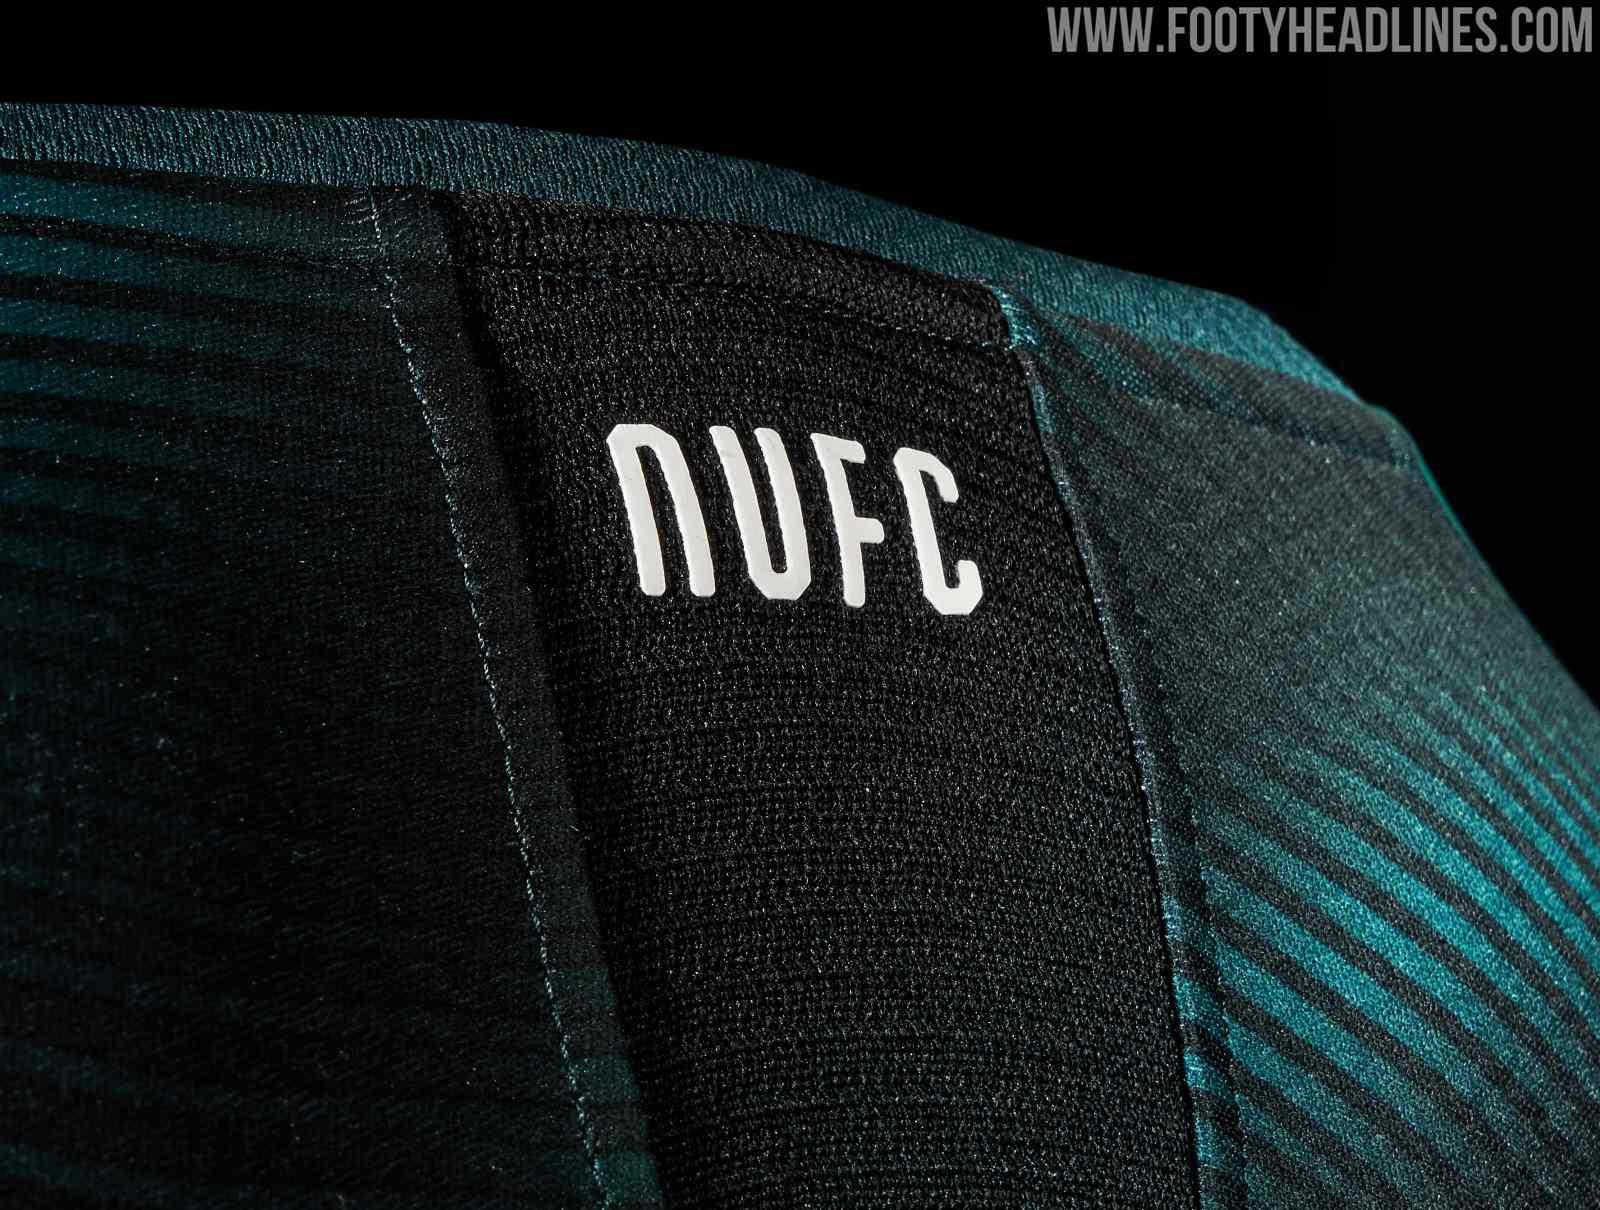 newcastle united 1920 away kit revealed footy headlines